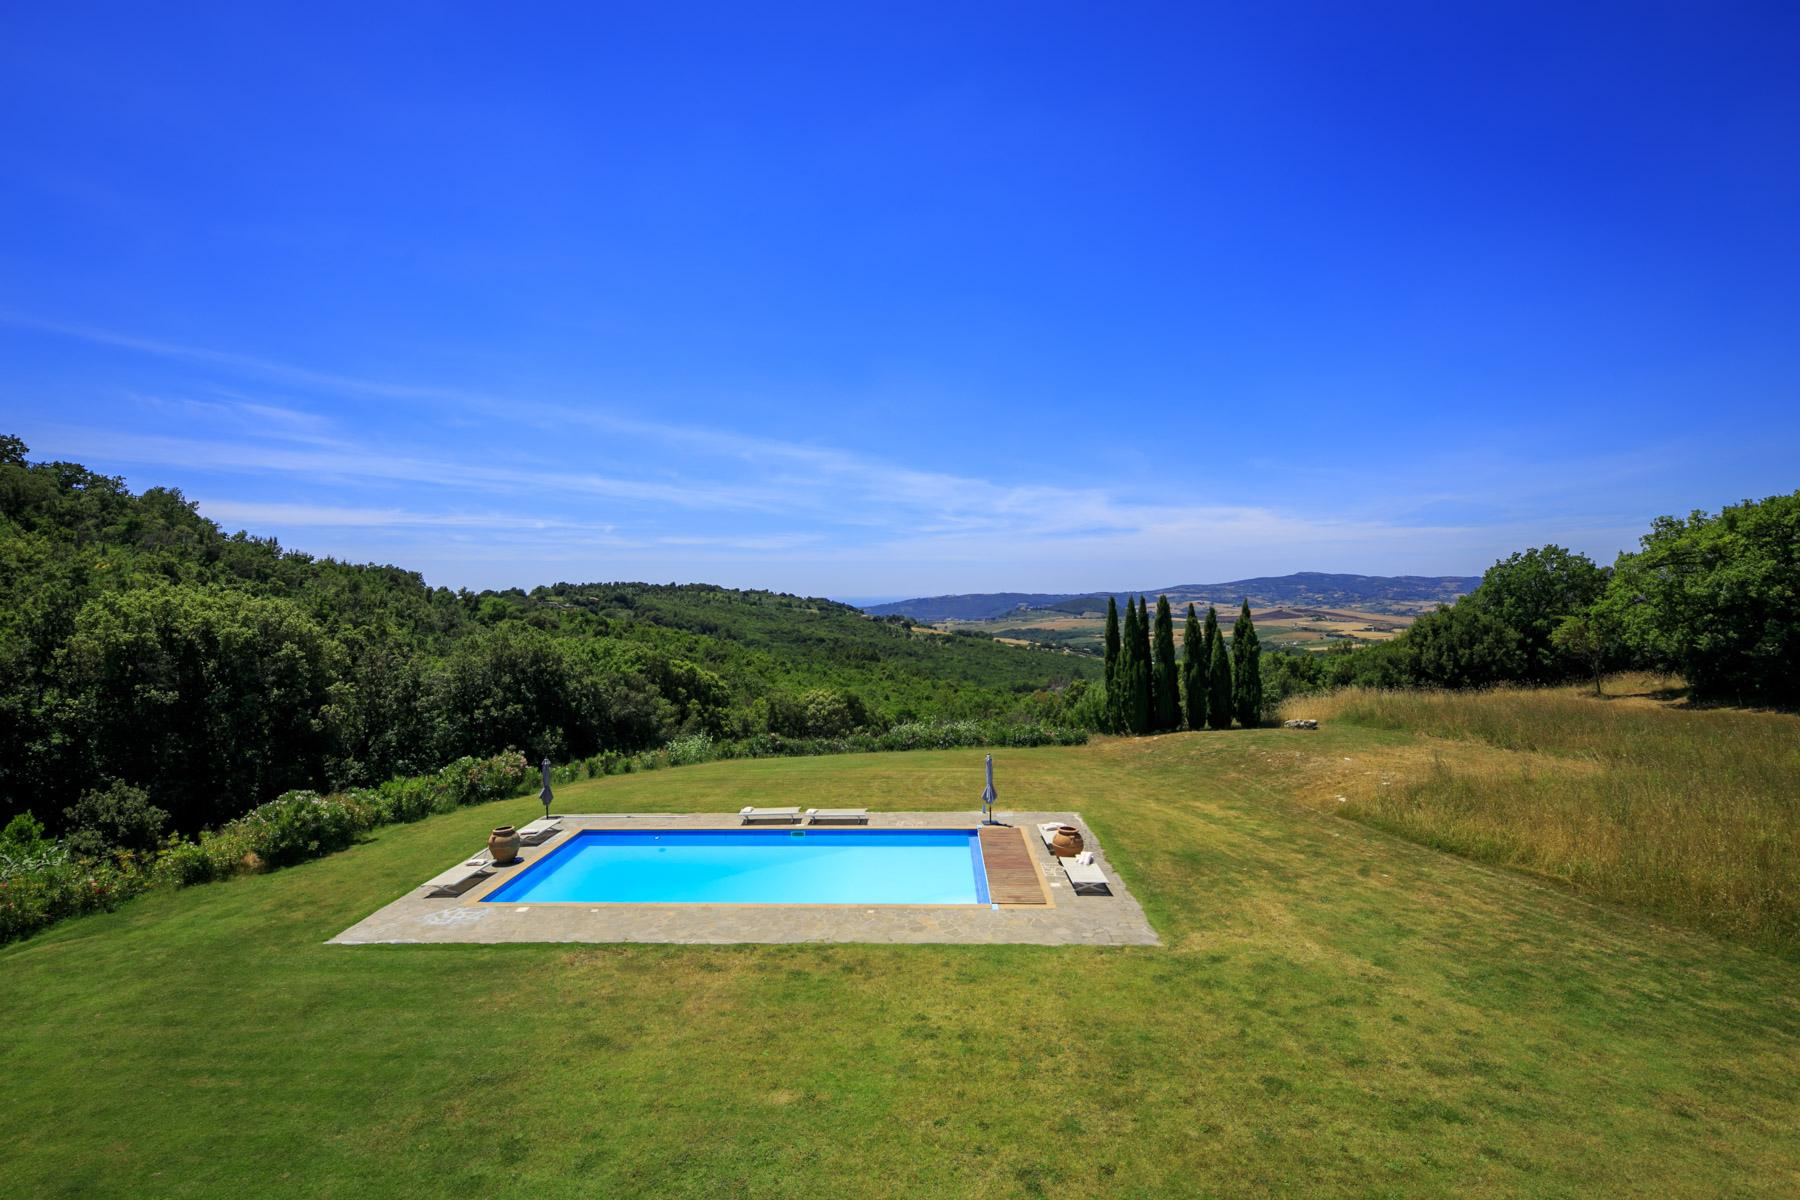 Belle villa toscane avec piscine - 25